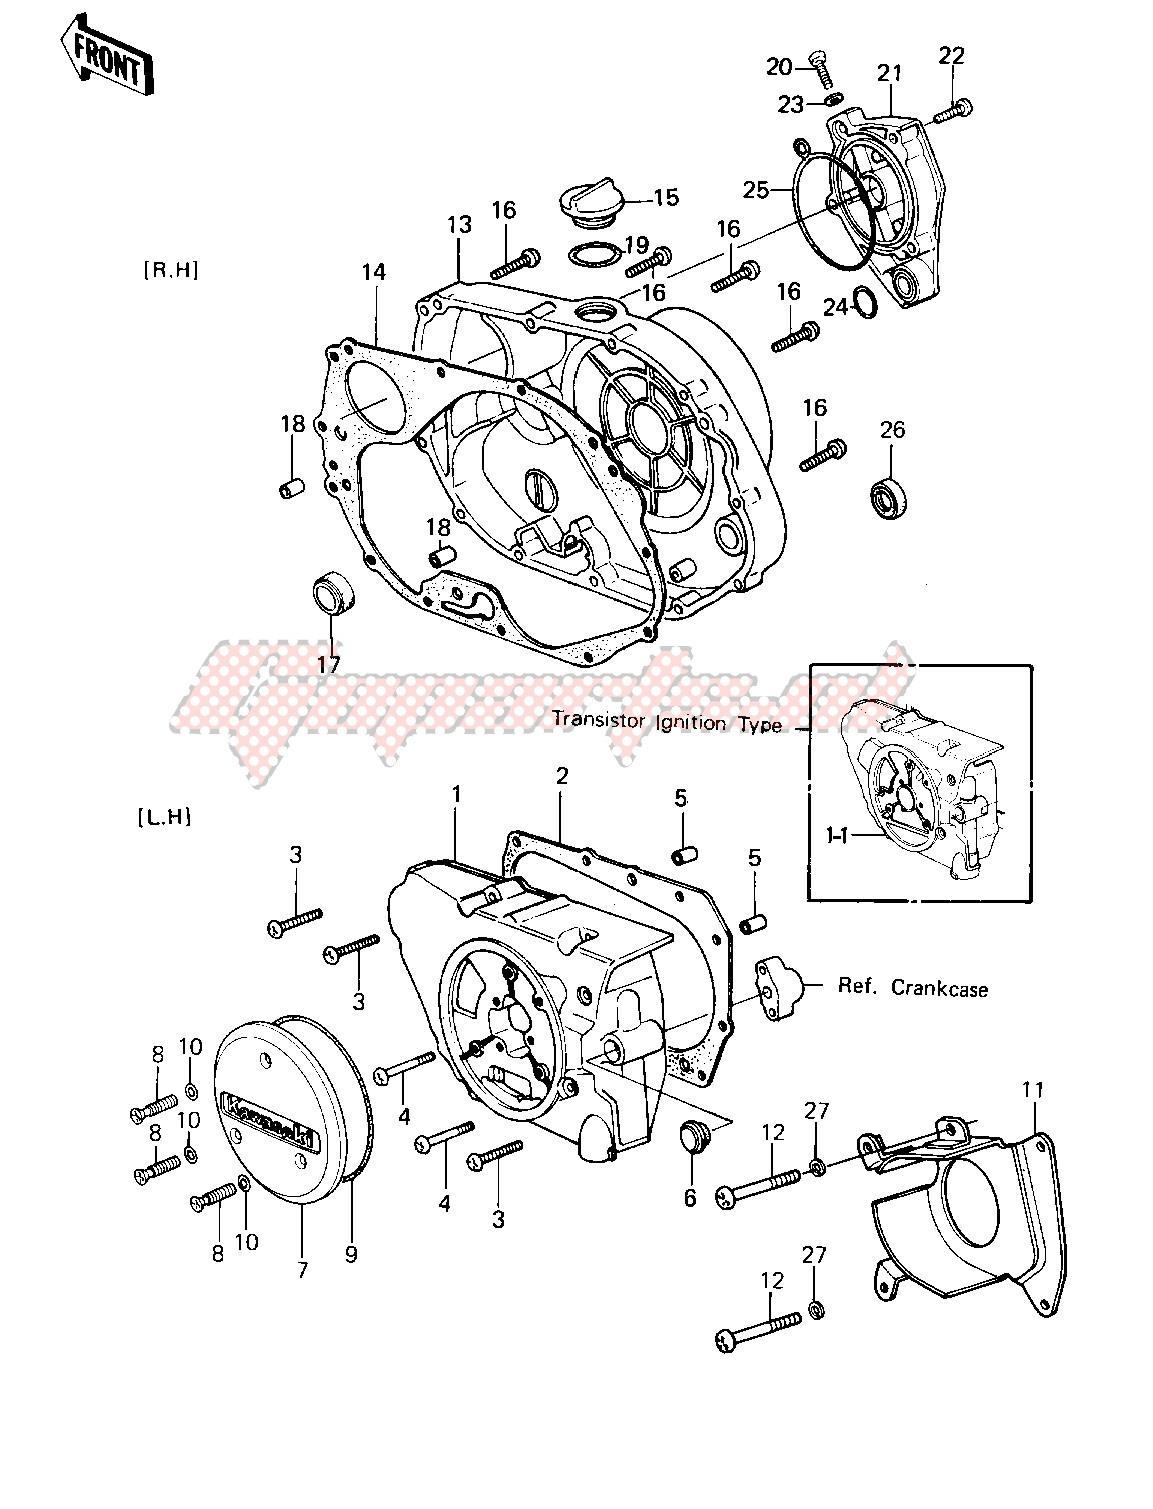 ENGINE COVERS -- 81-82 KLT200-A1_A2_A3- - image